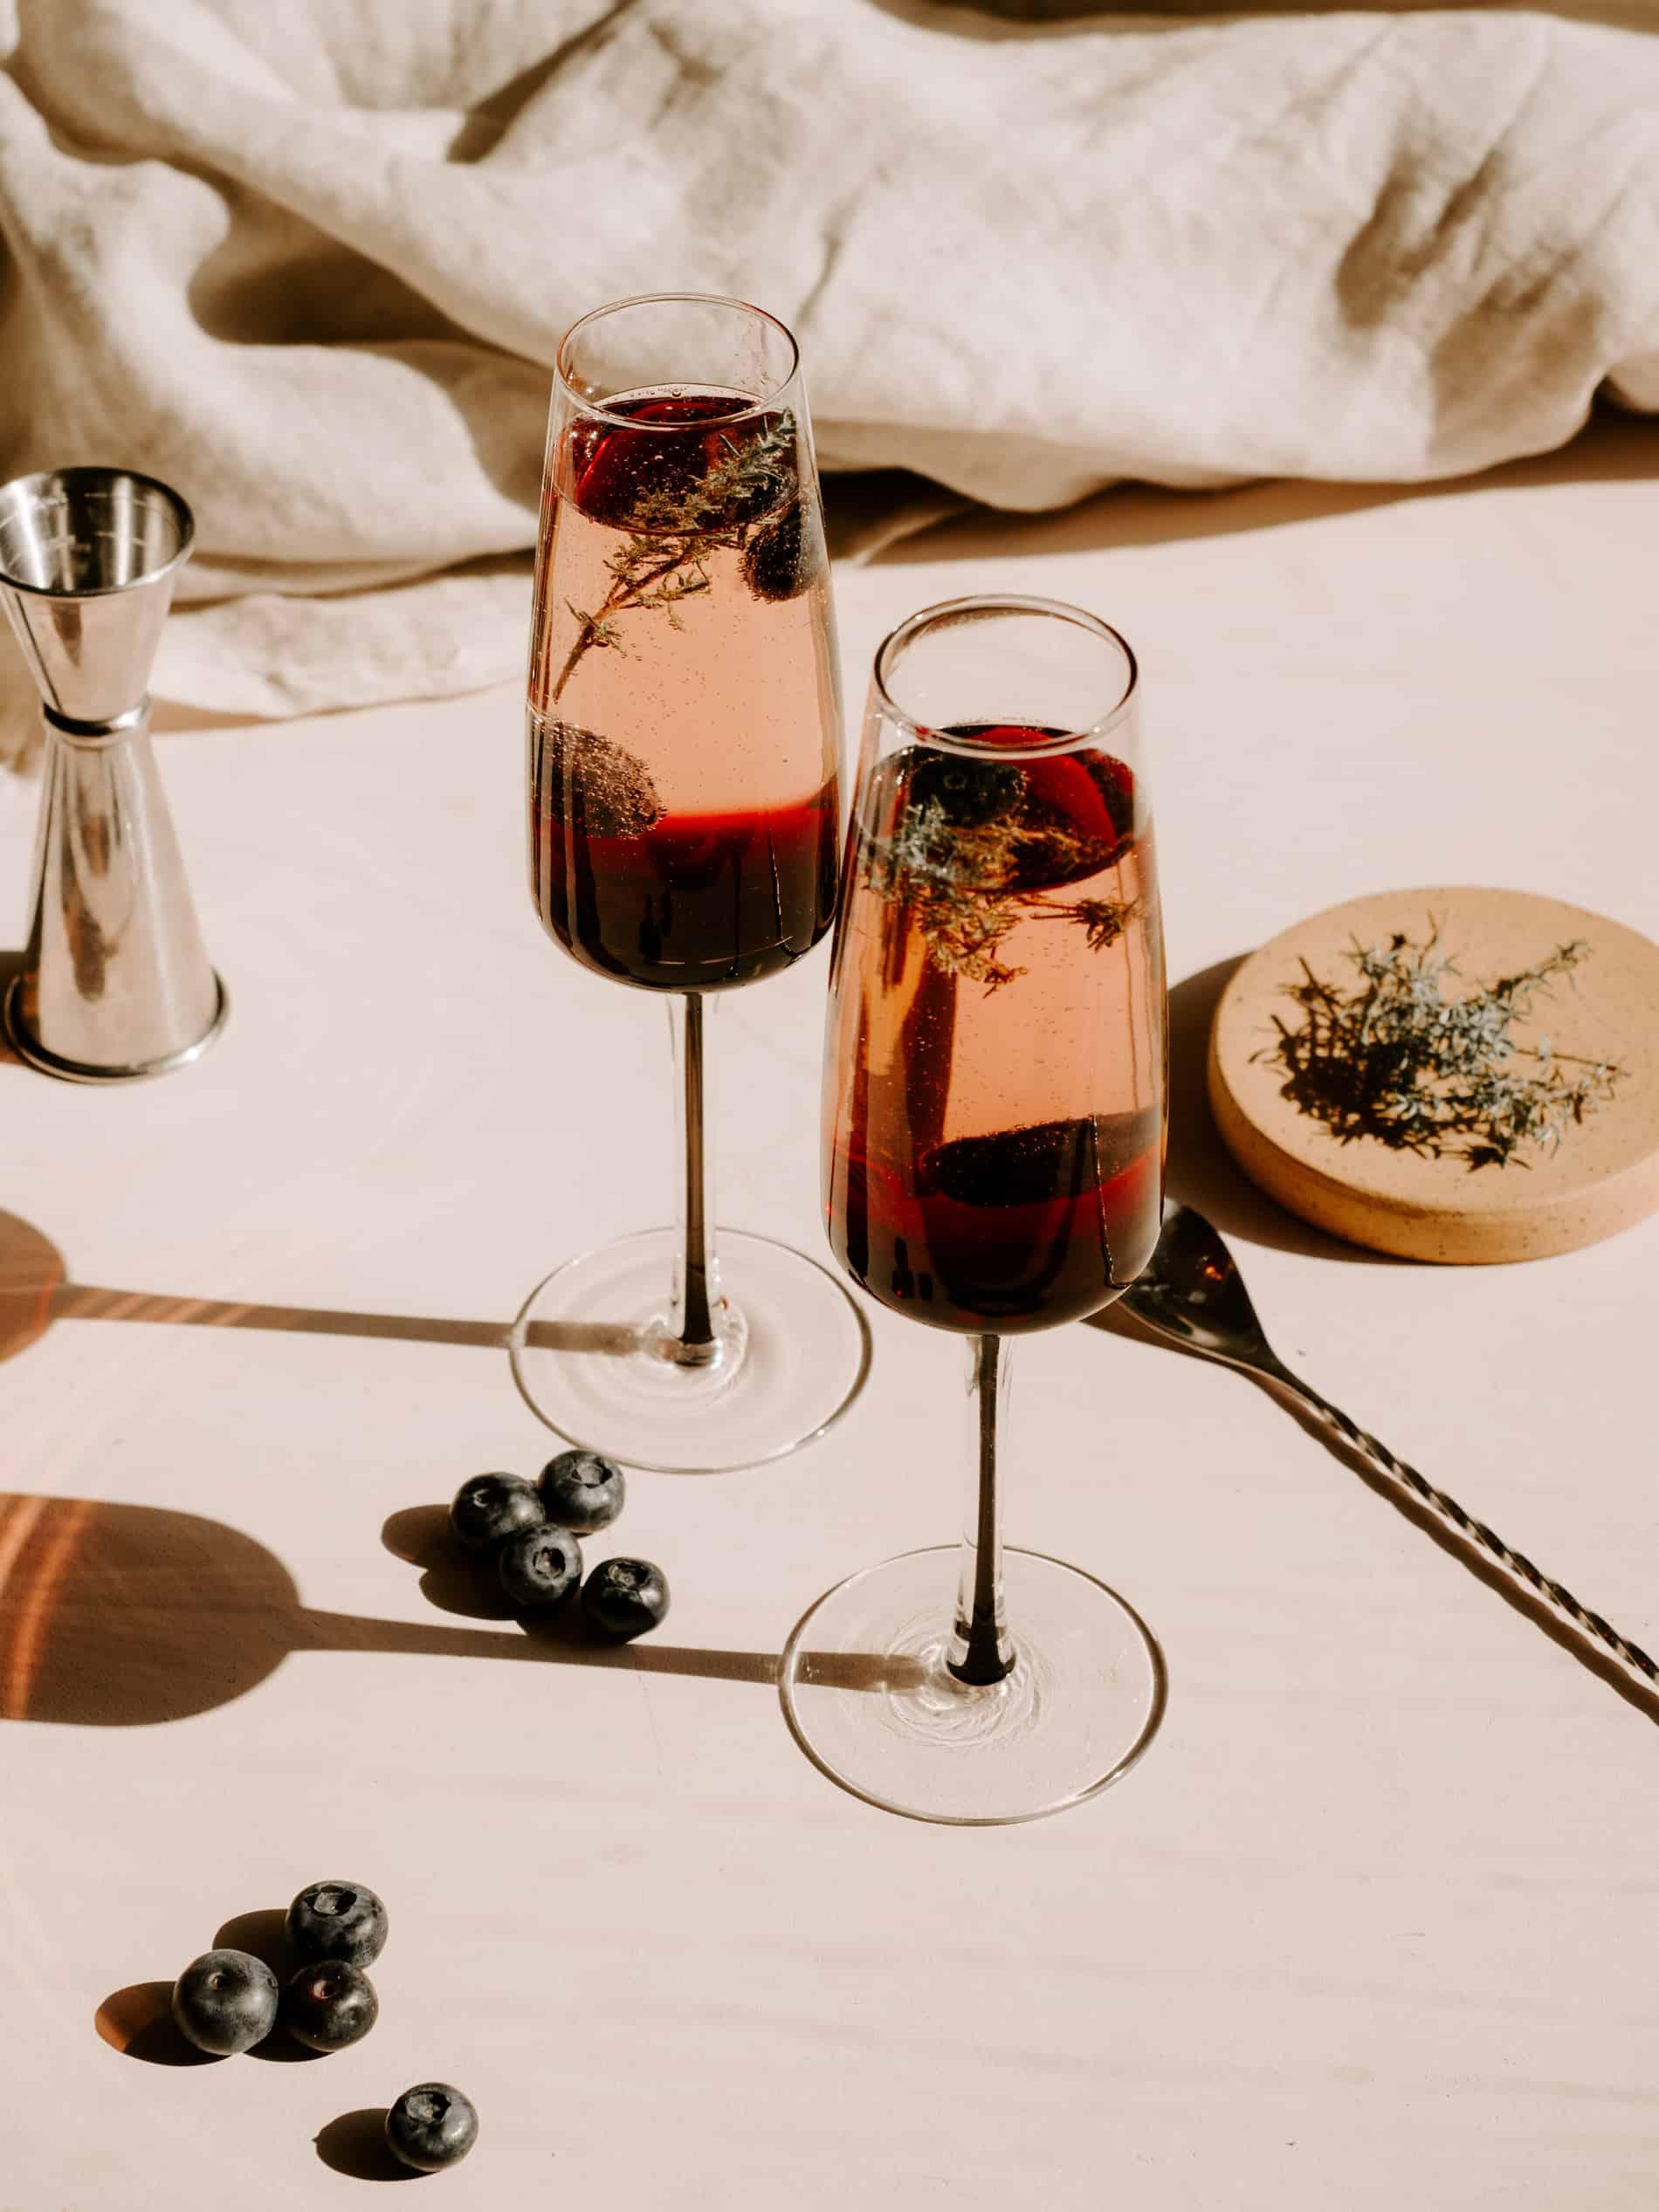 recette cocktail au champagne myrtille thym blog lifestyle Lili in Wonderland